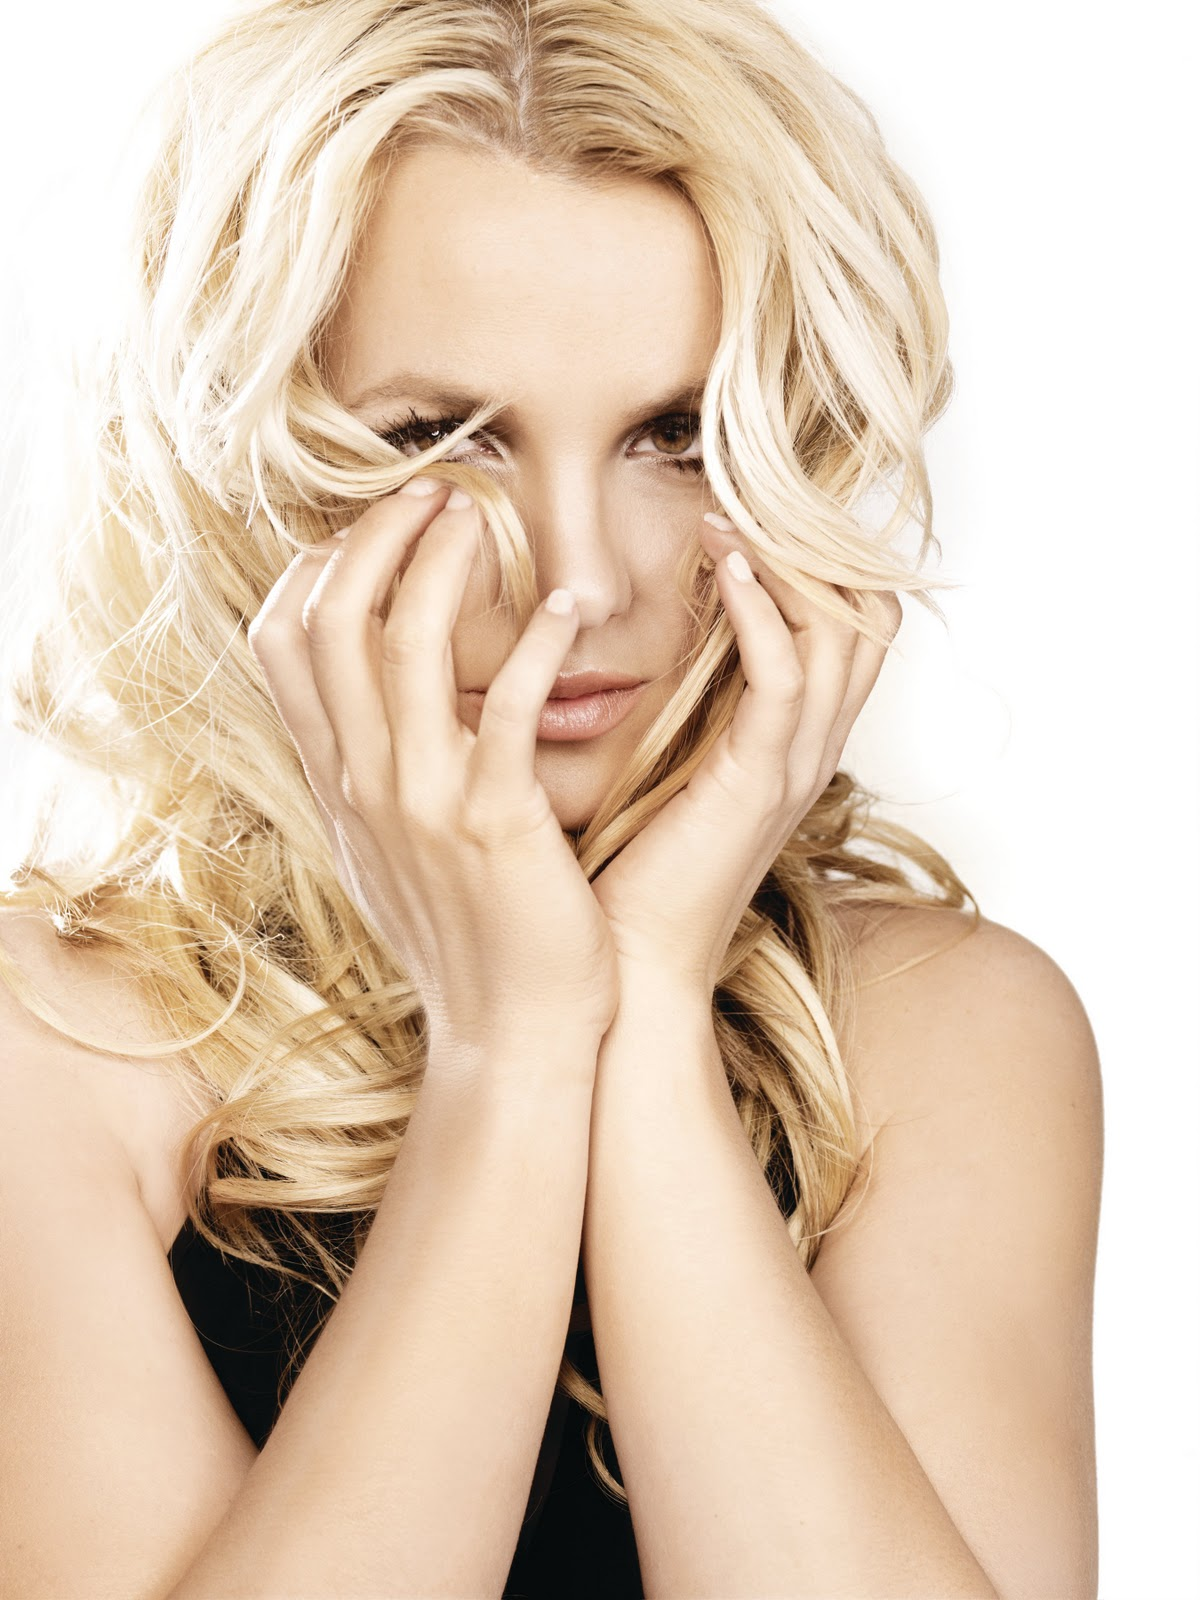 http://gangster.squarespace.com/storage/Britney_Spears_FemmeFatalepromo1.jpeg?__SQUARESPACE_CACHEVERSION=1301937188744